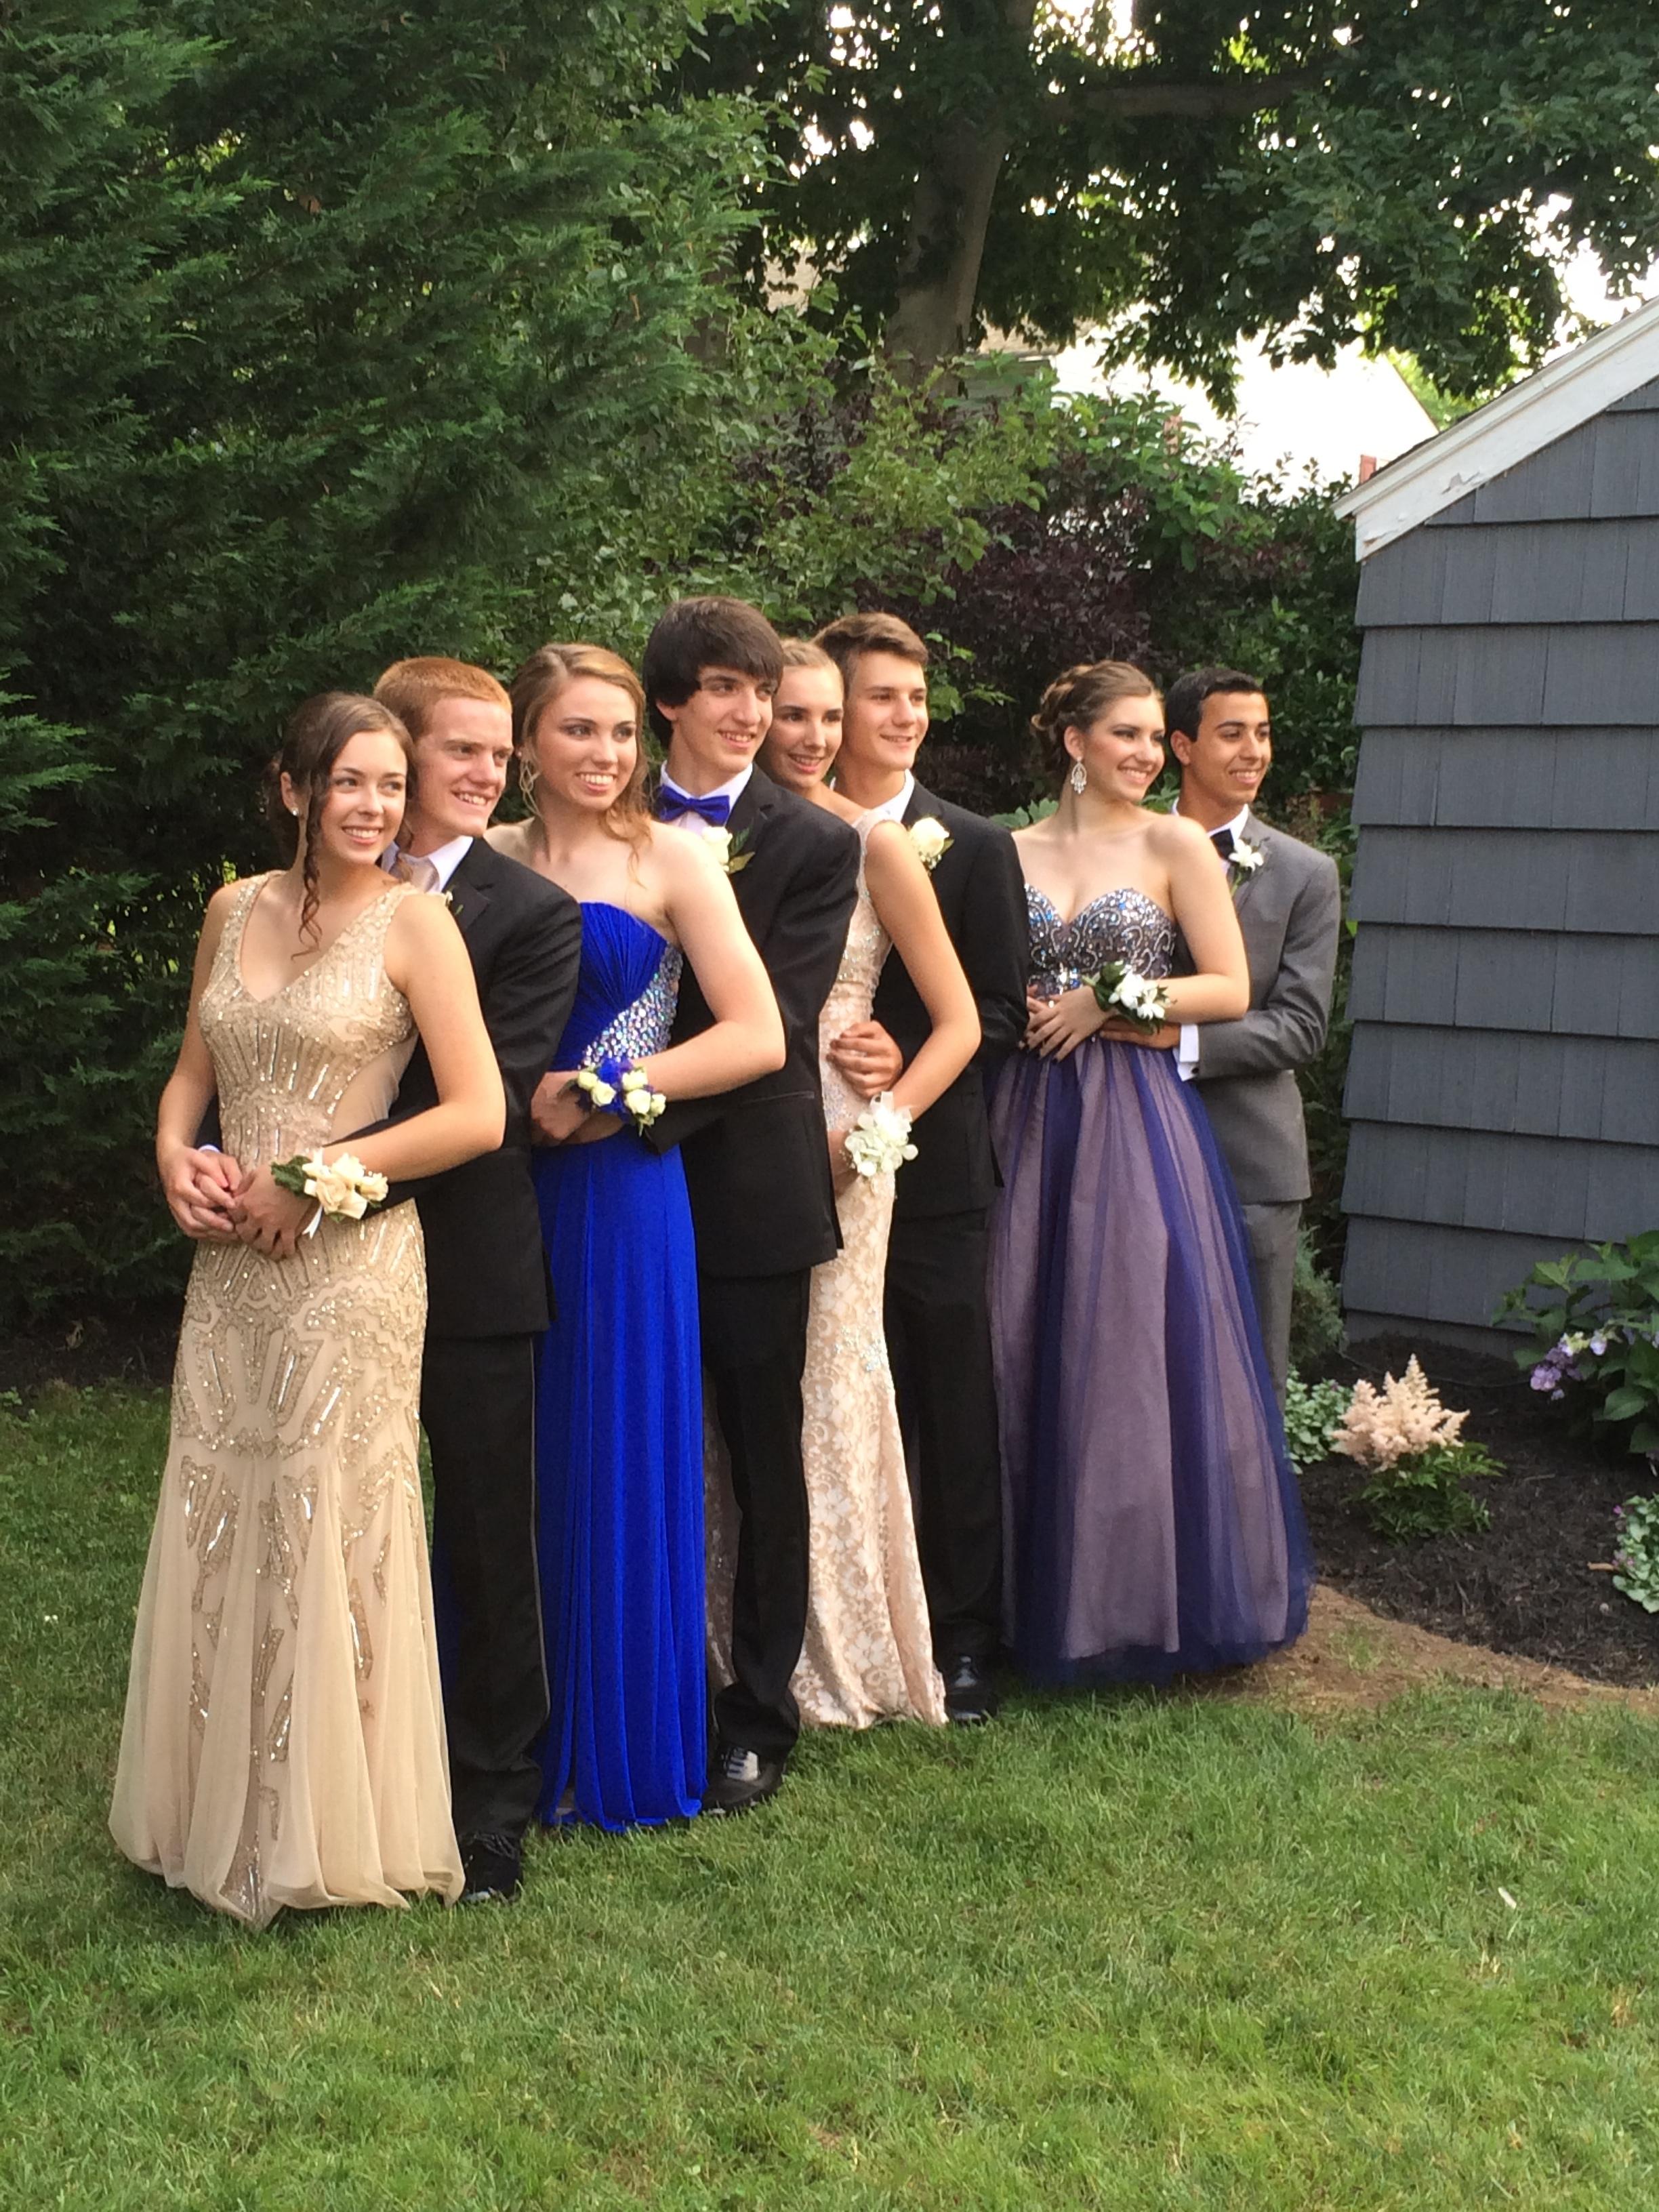 794cdb39b67d3ea8c78d066JPG Cranford High School 2015 Senior Prom